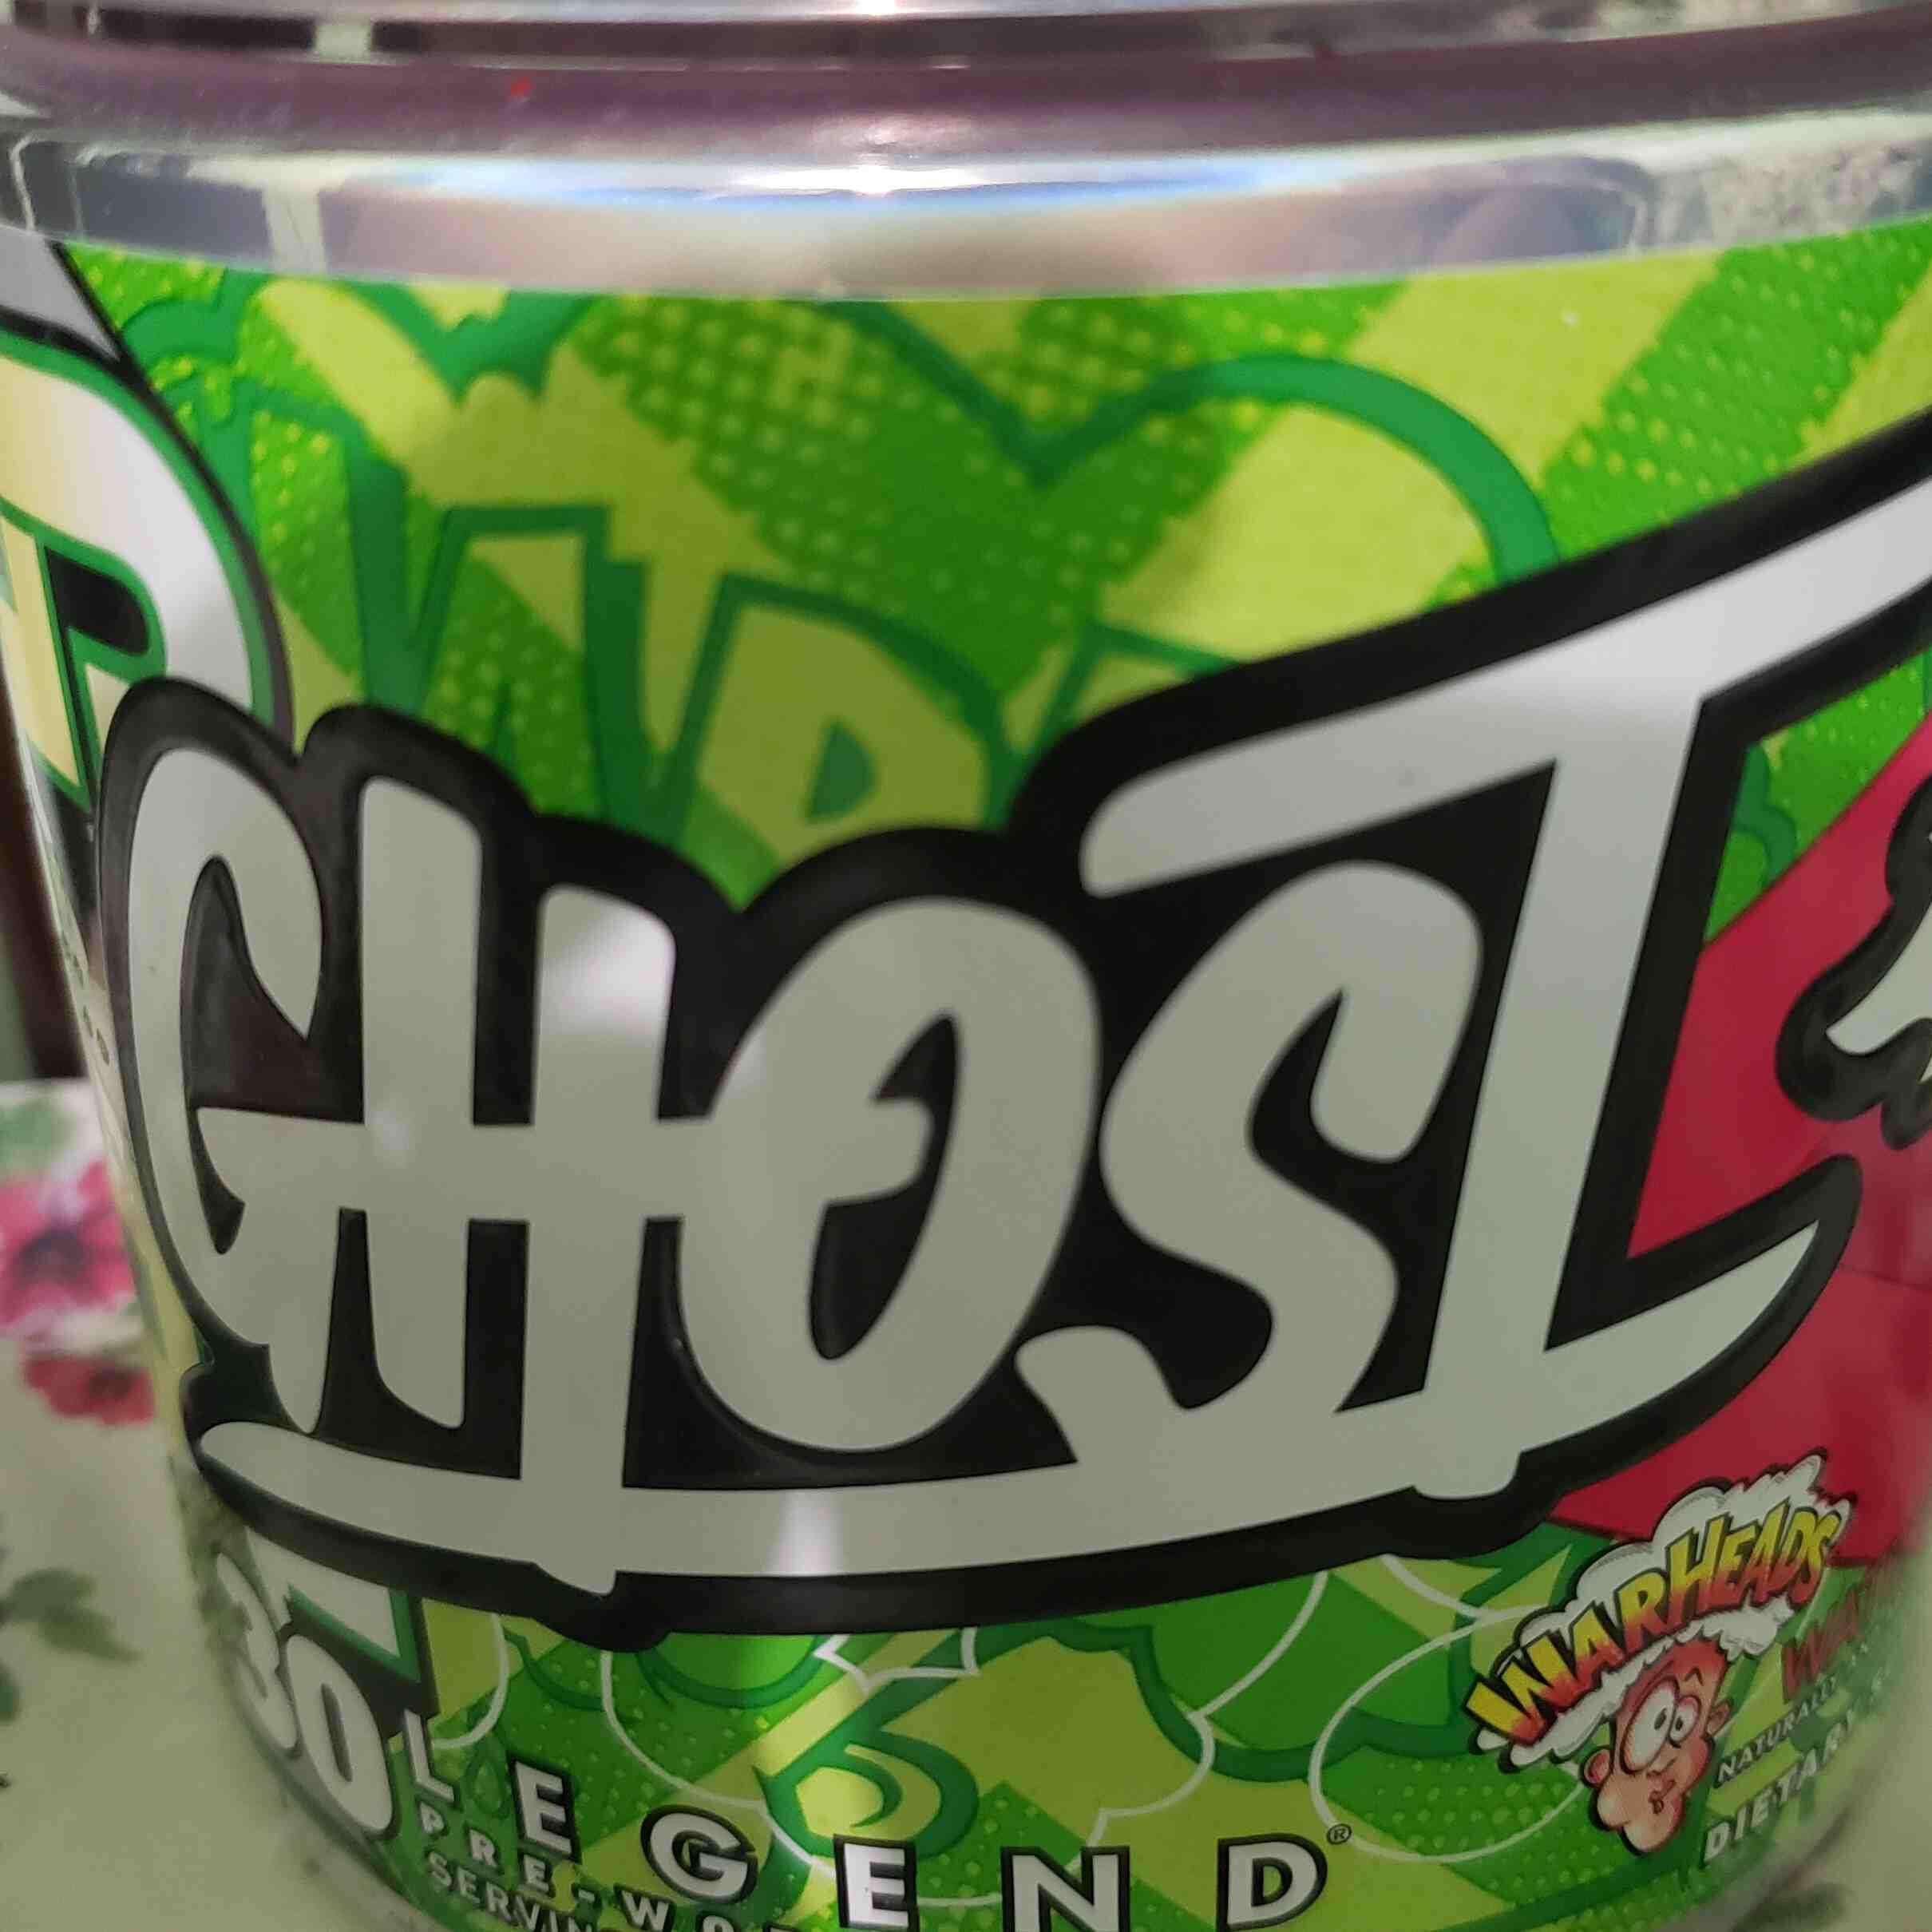 ghost preworkout - Product - en